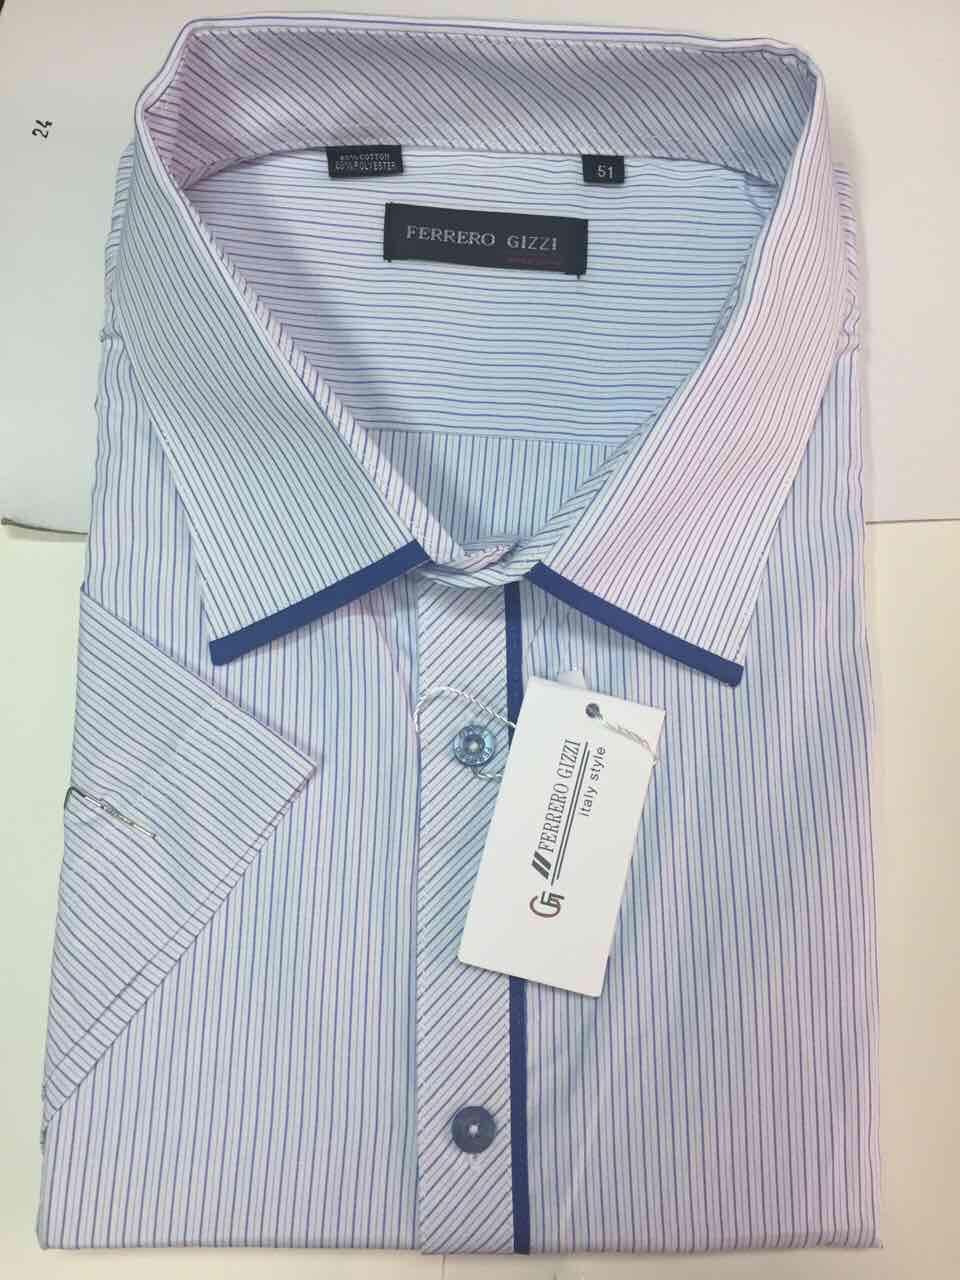 Рубашка мужская короткий рукав Ferrero Gizzi ботал SKY 1562 BK